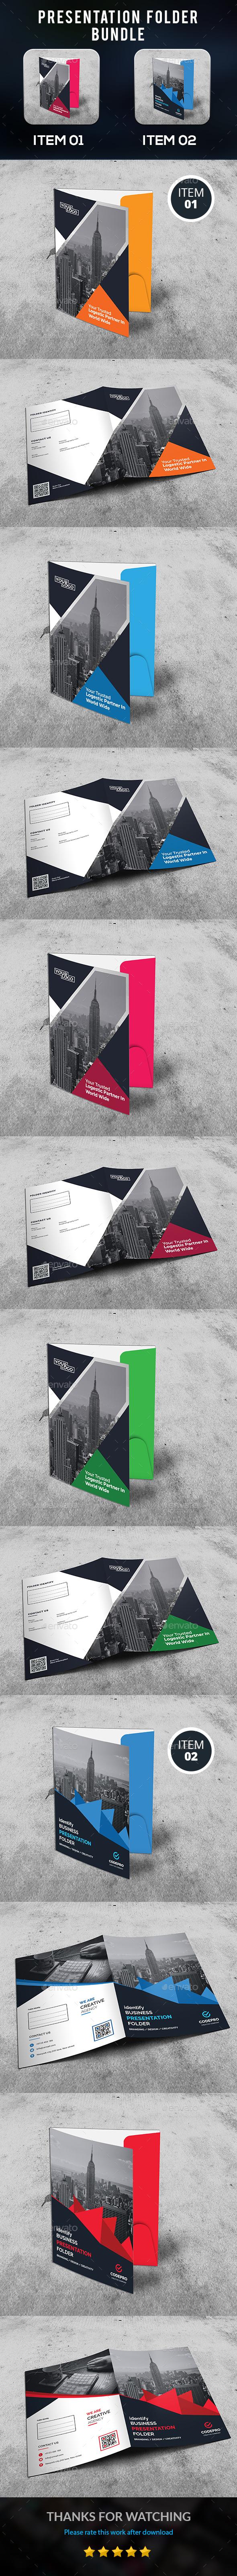 Presentation Folder Bundle - Stationery Print Templates